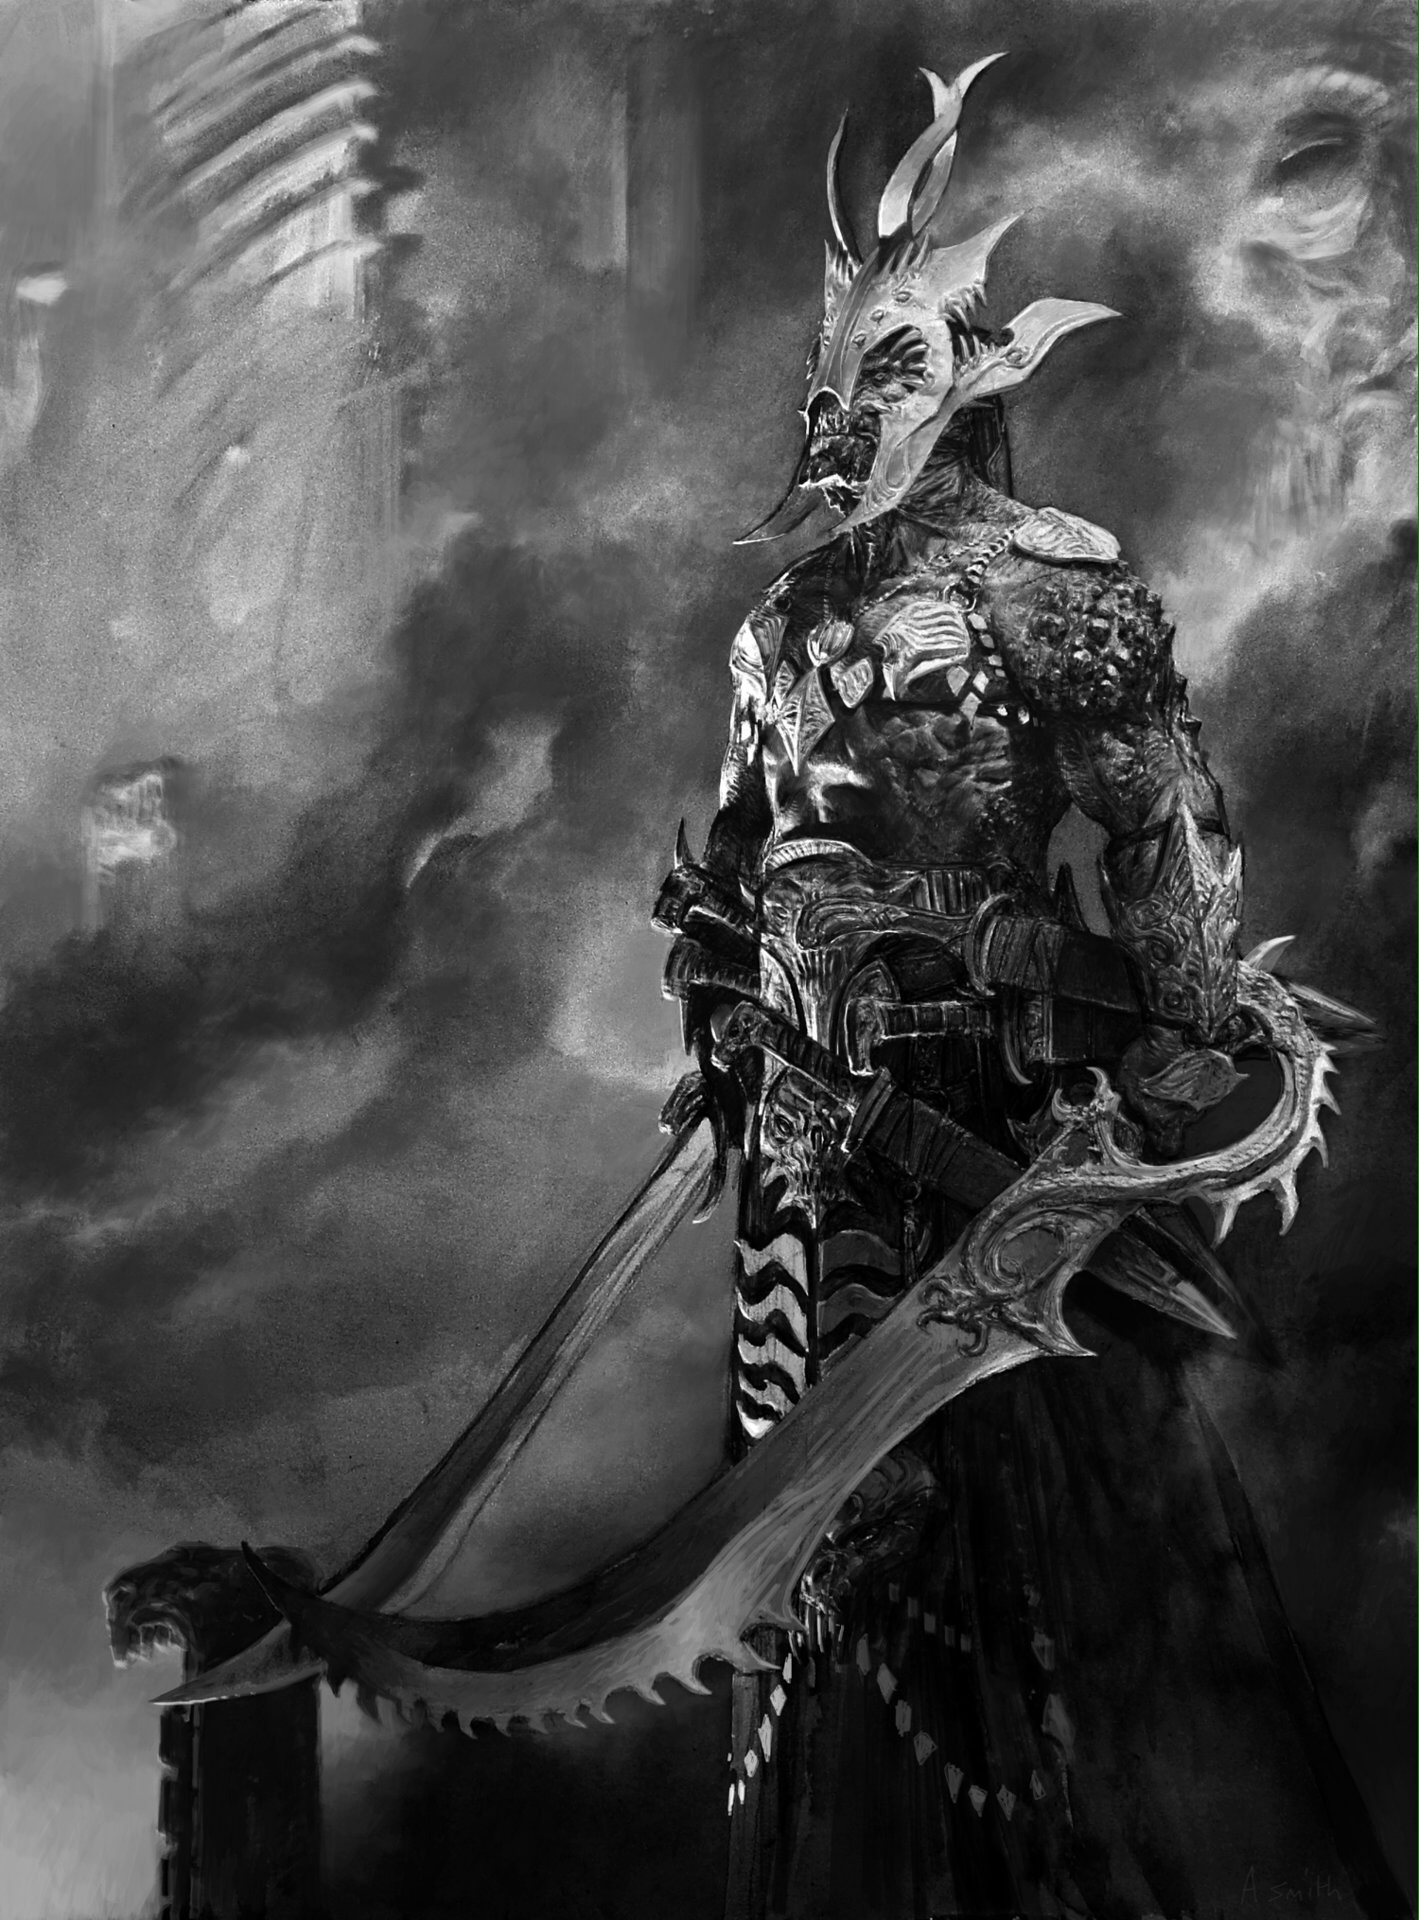 3d Wallpaper Portrait Amazing Fantasy Illustrations By Adrian Smith Illustrator